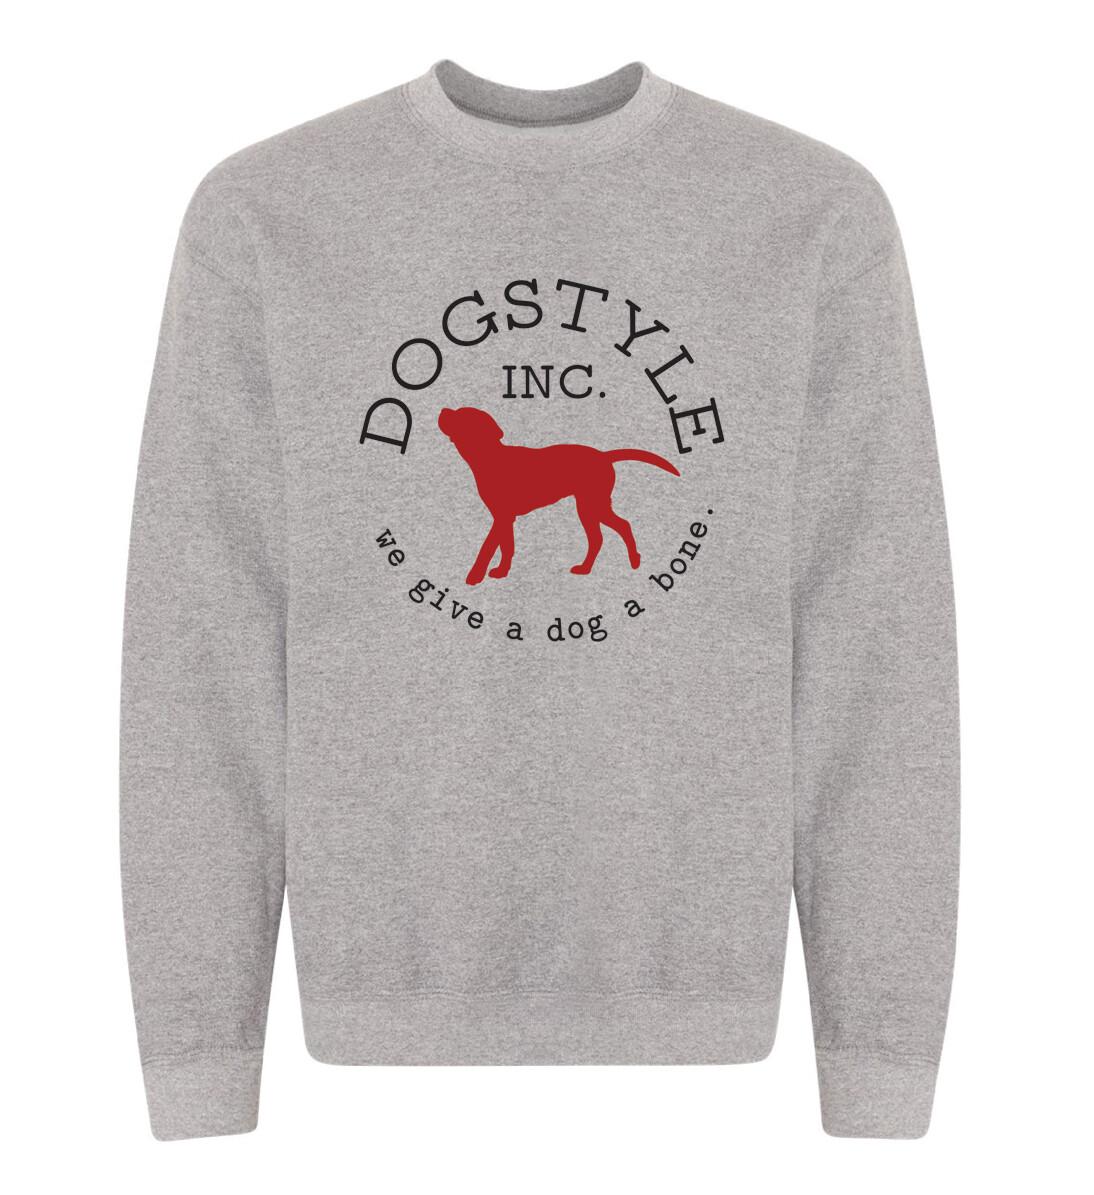 Dogstyle Crew Neck Sweatshirt - Graphite Heather